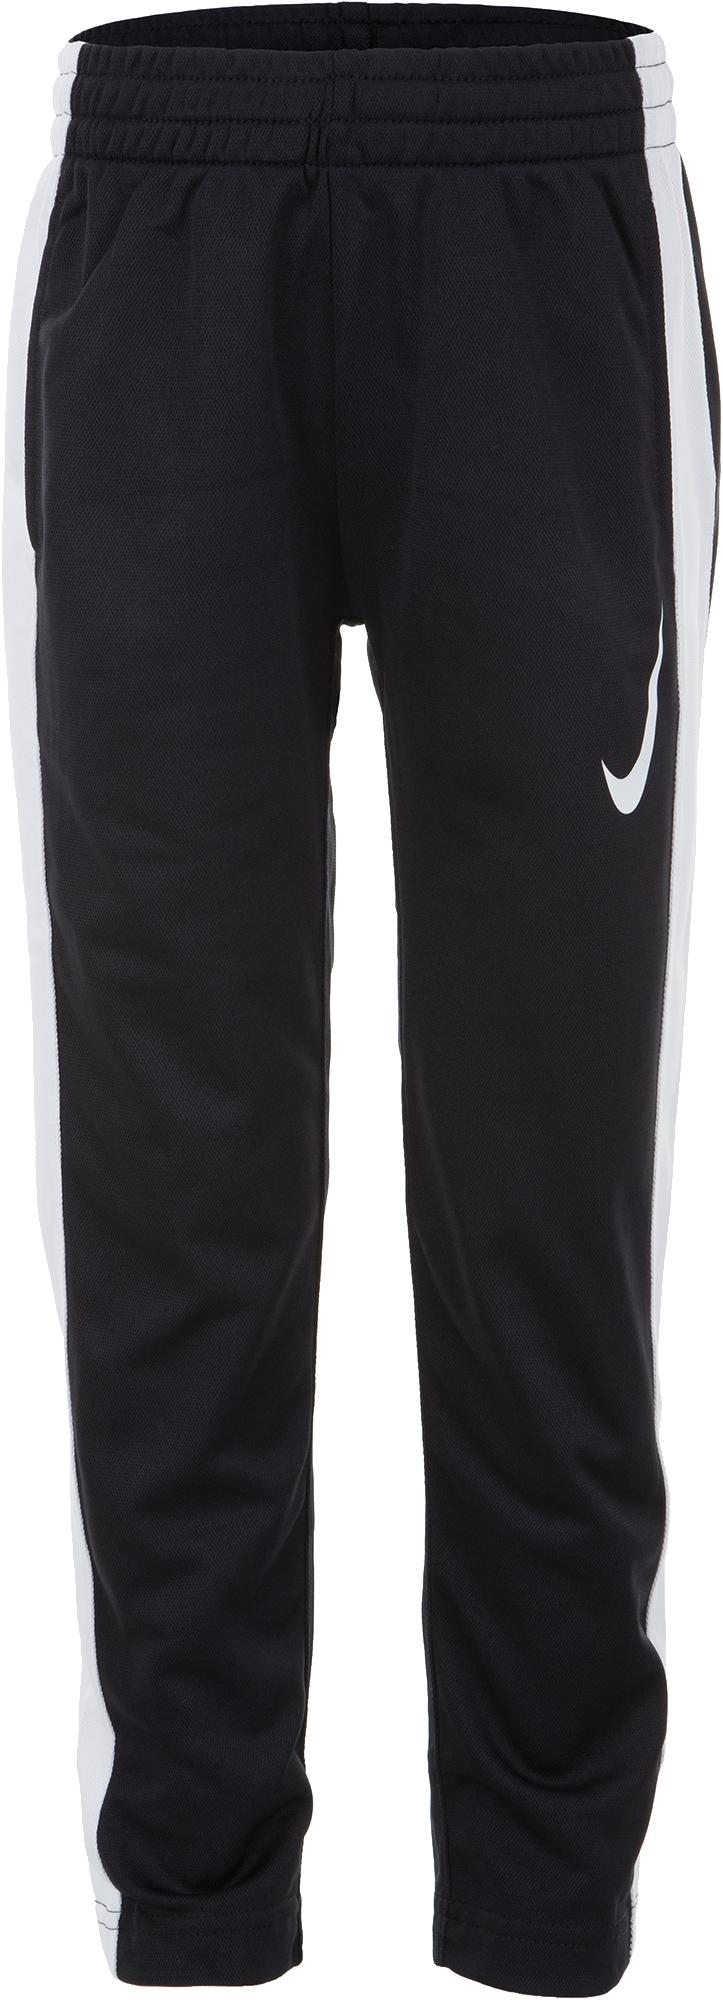 купить Nike Брюки для мальчиков Nike Performance, размер 122 недорого